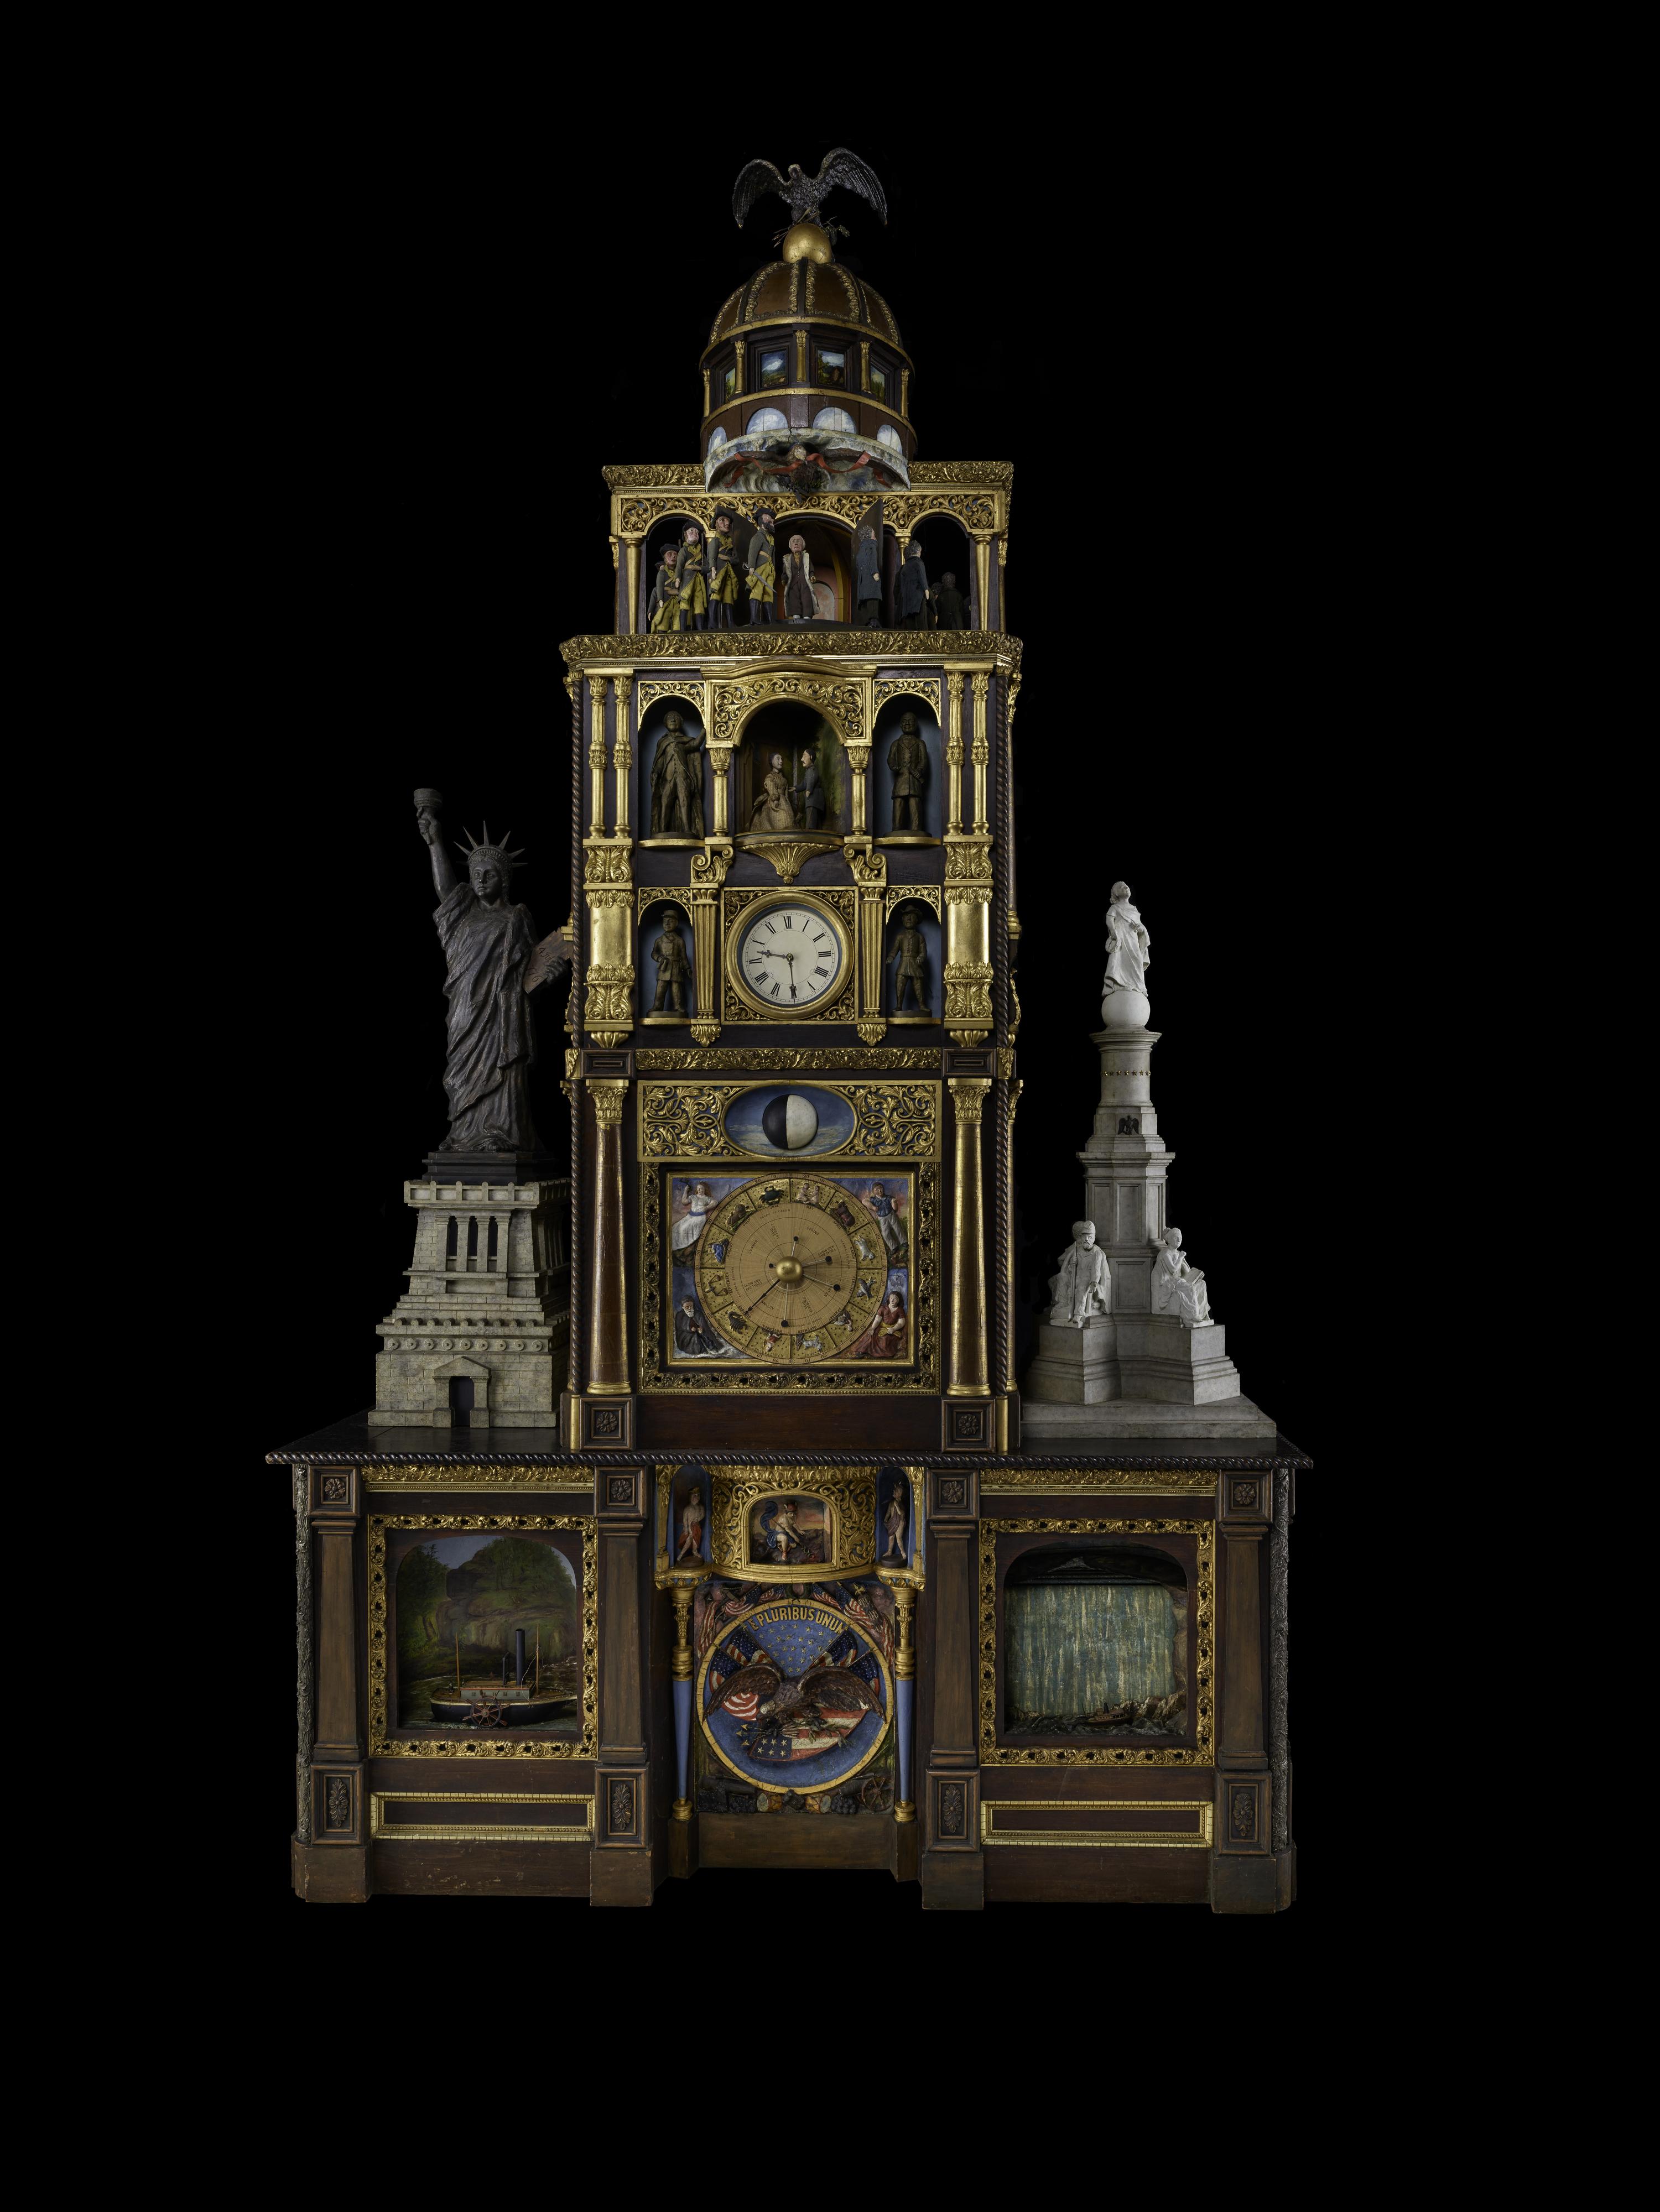 Elaborately constructed story clock